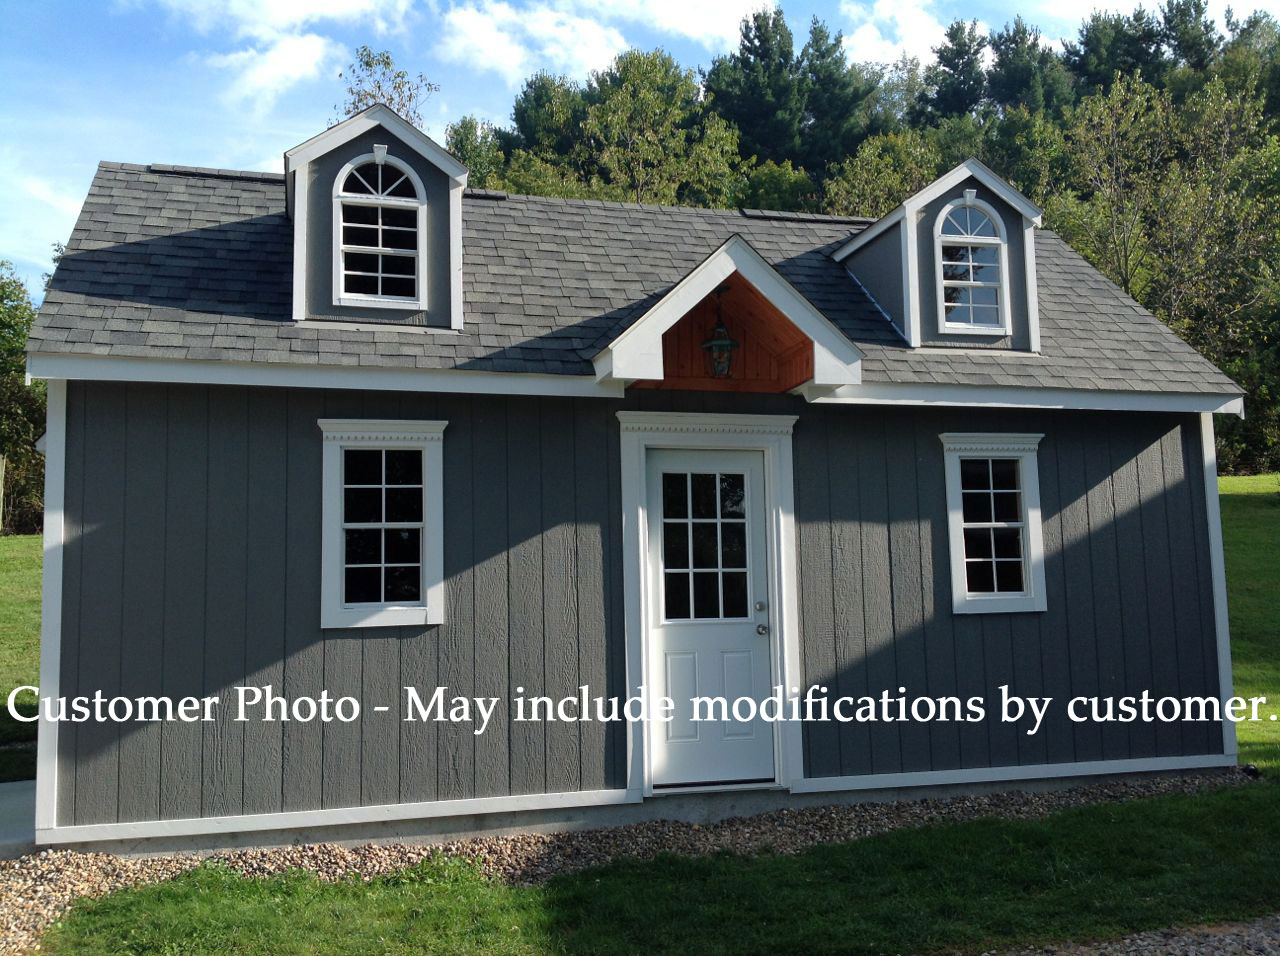 Best Barns Belmont 12 ft x 16 ft Wood Storage Shed Kit t